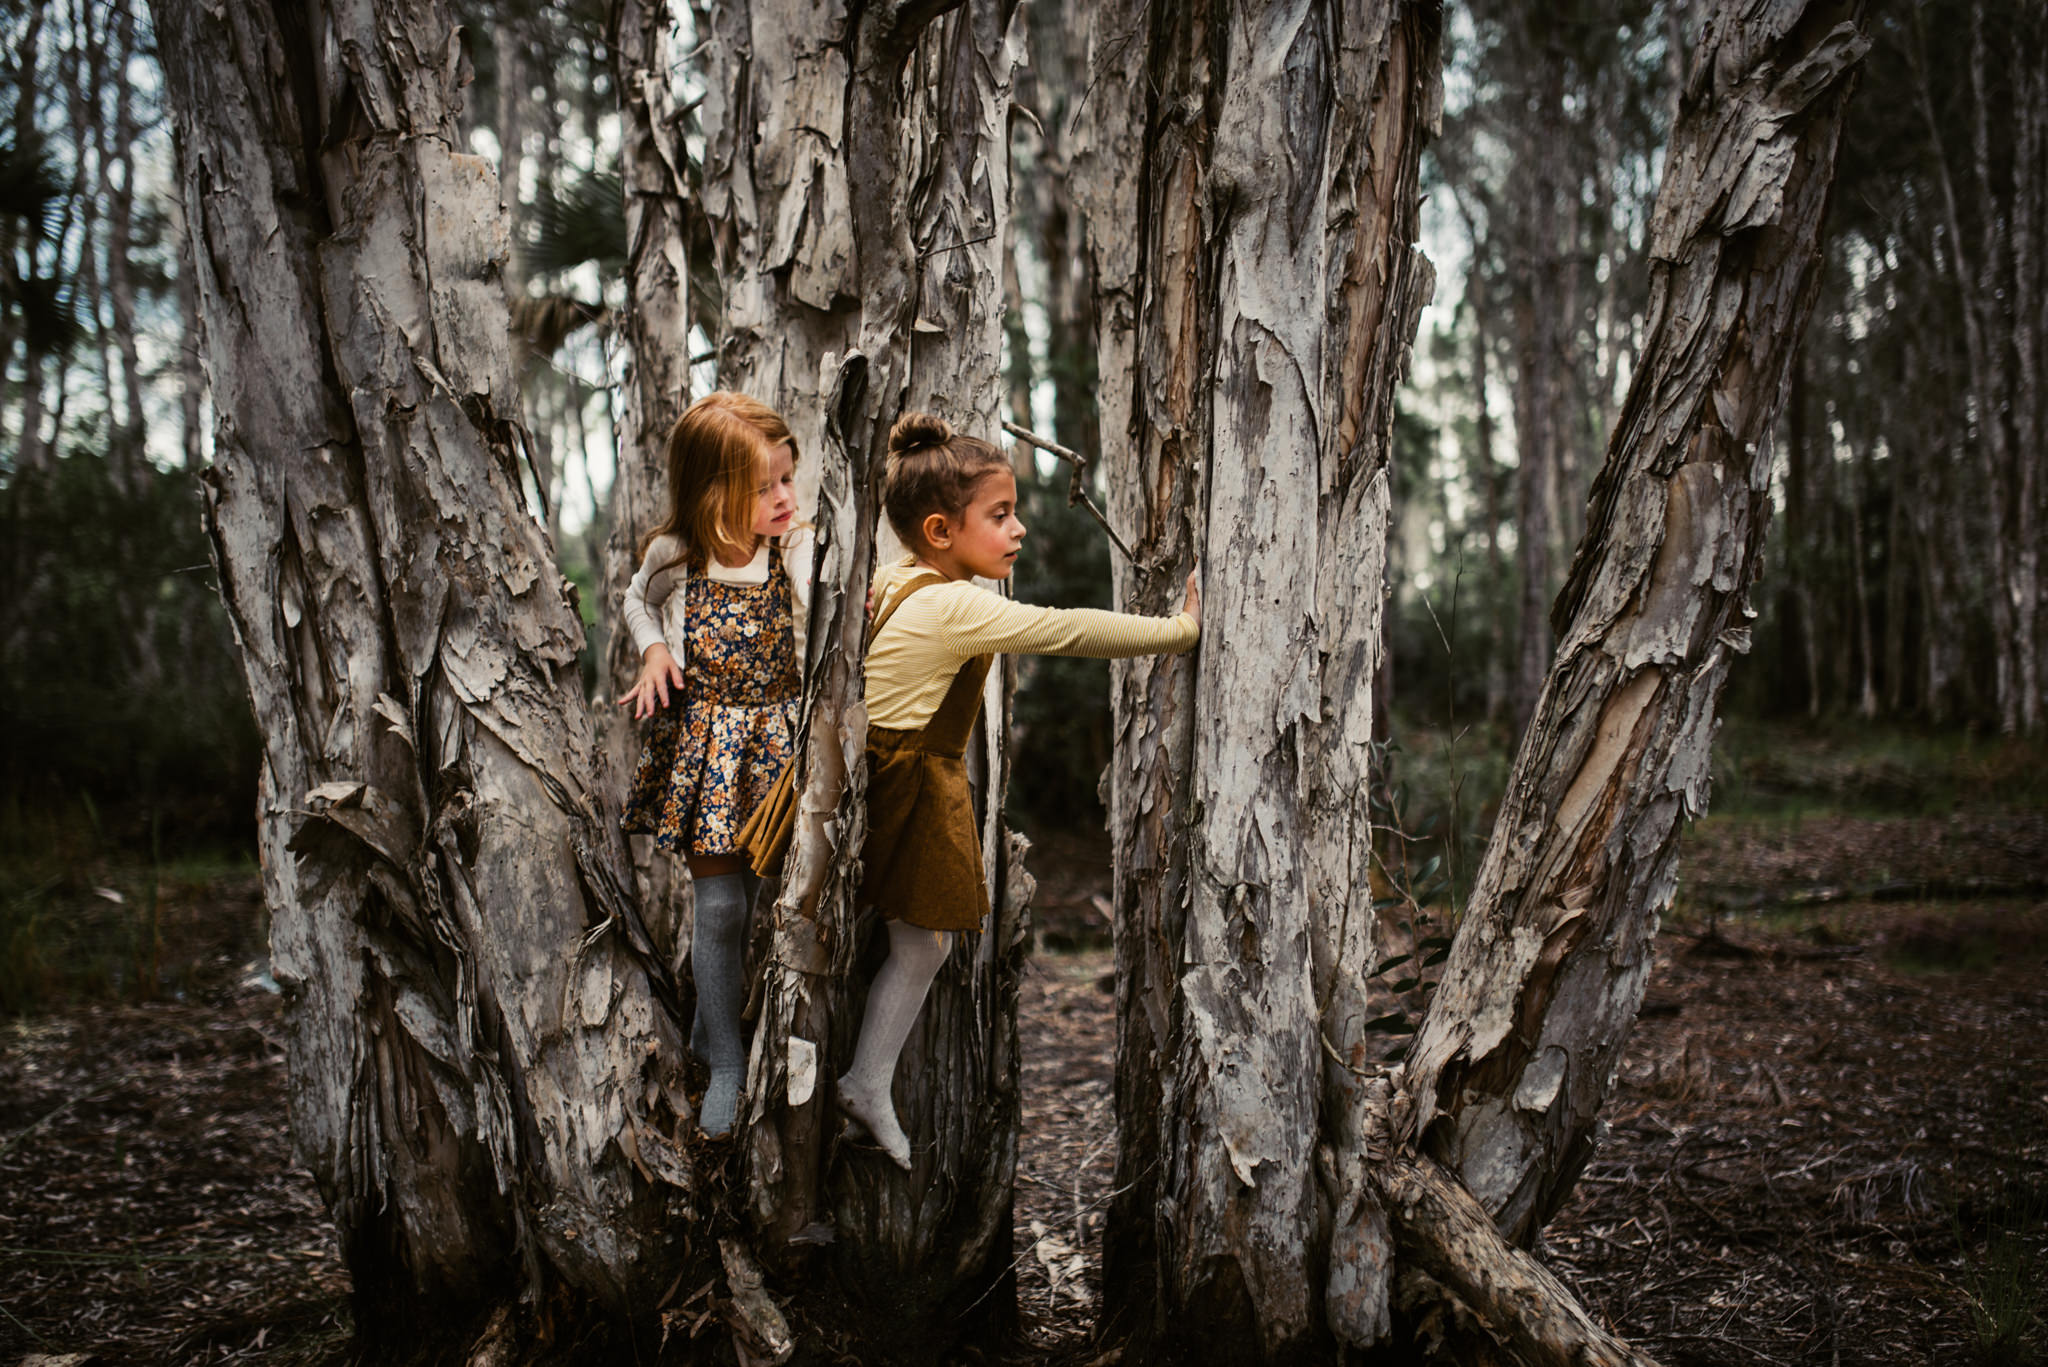 twyla jones photography - treasure coast florida - childrens adventure clothing commercial shoot--16.jpg